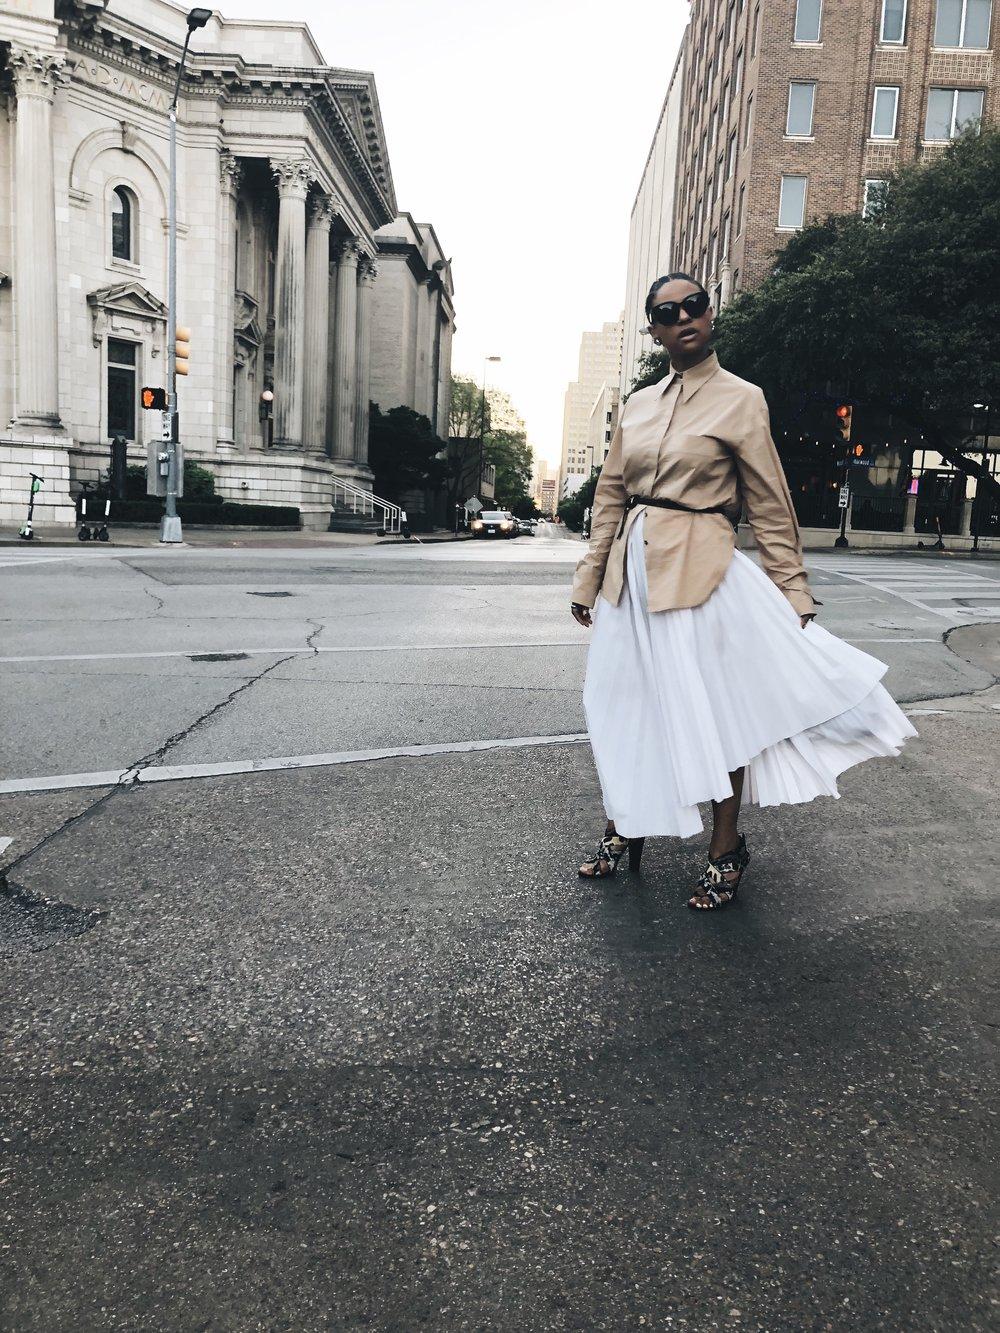 Rejina Pyo Blouse ( similar ). A.W.A.K.E Skirt ( similar ).  J Crew Leopard Belt . Giuseppe Zanotti Sandals ( similar ). Vintage Bag and Earrings.